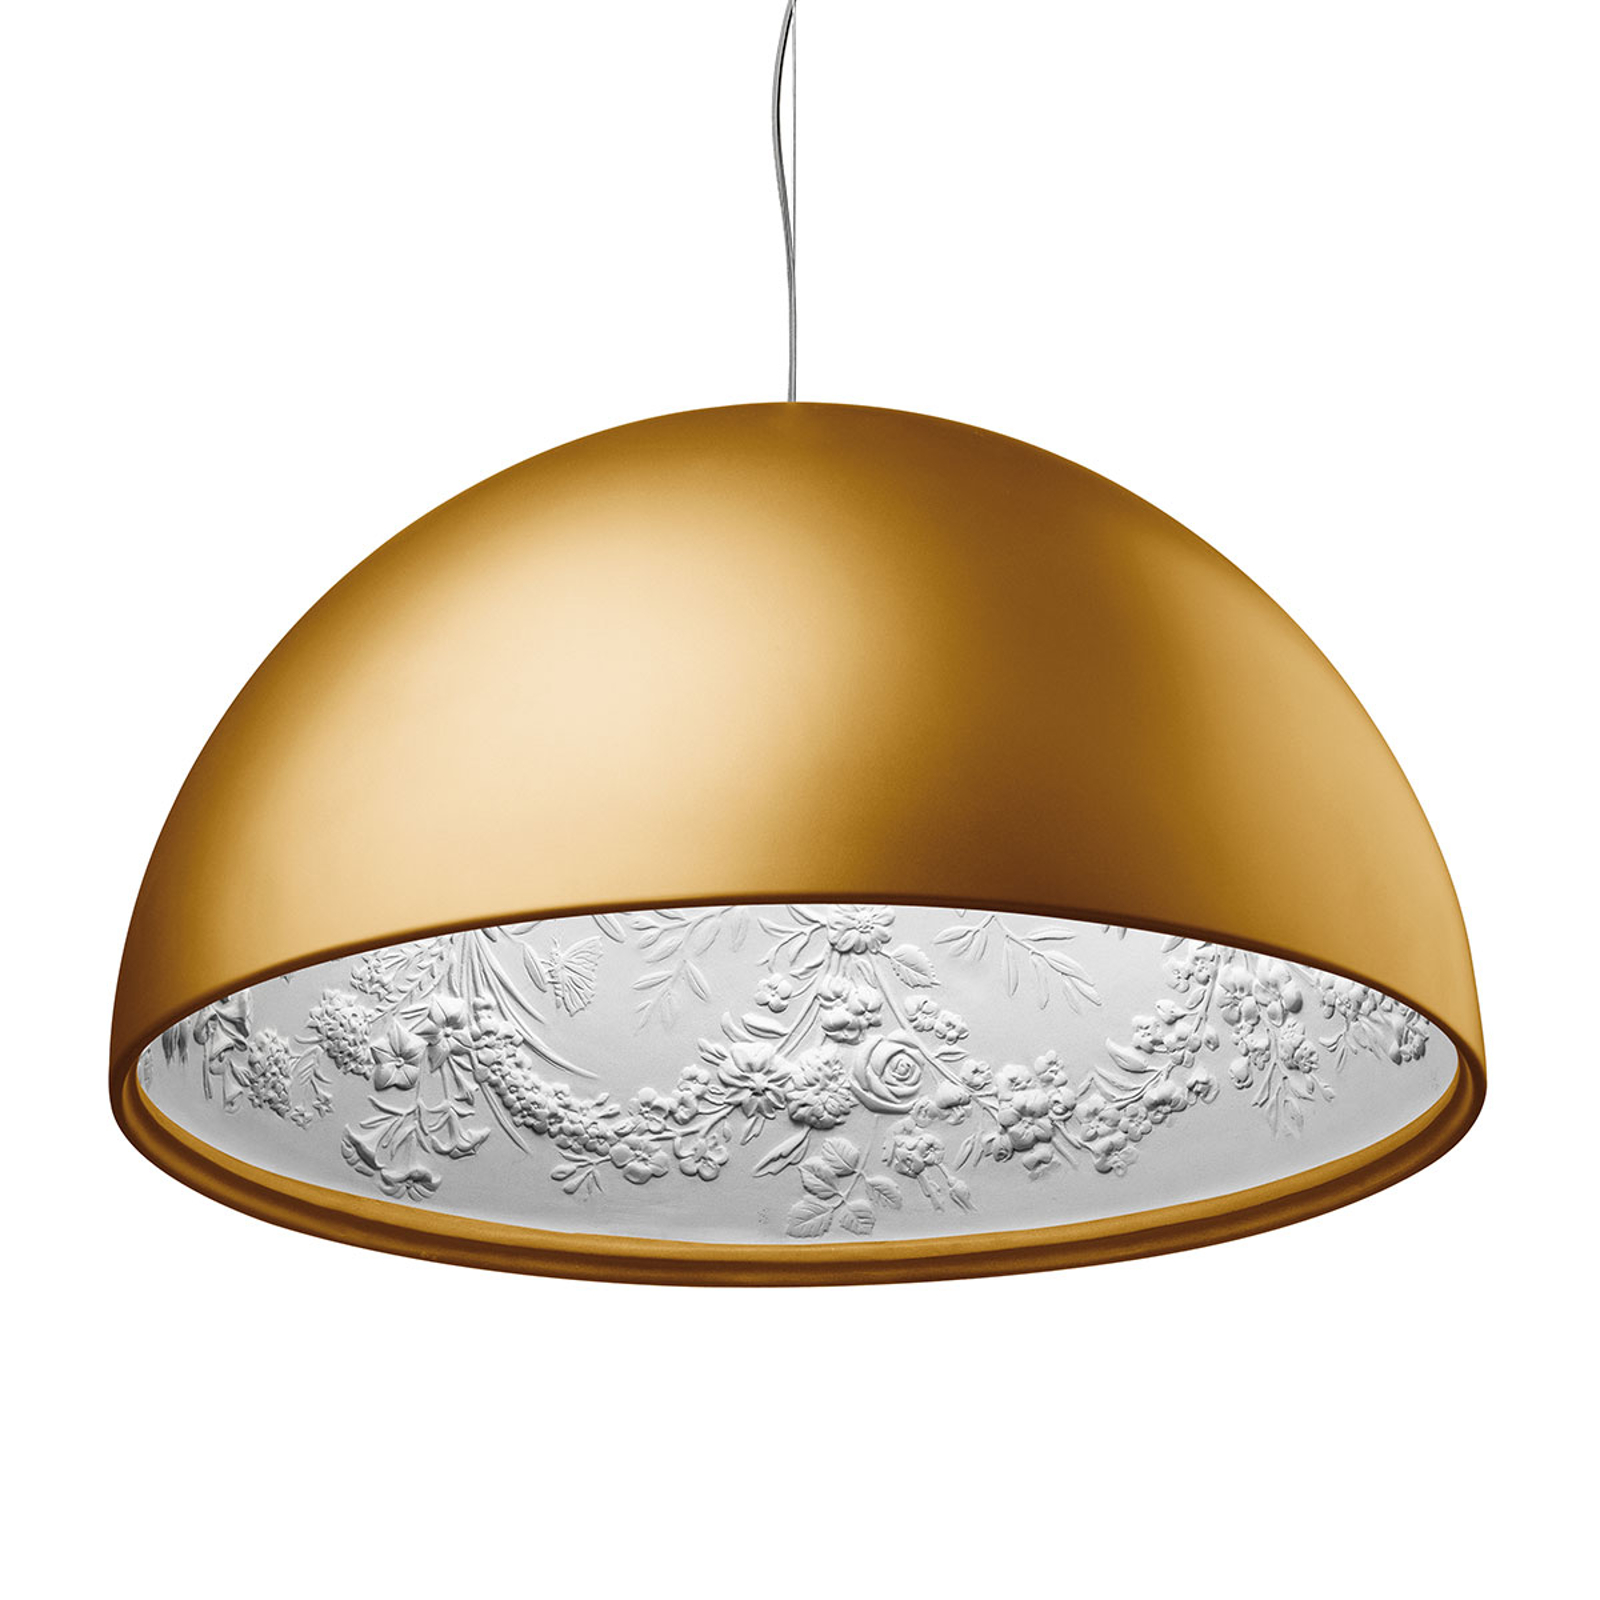 FLOS Skygarden 1 hanging light, gold_3510008_1